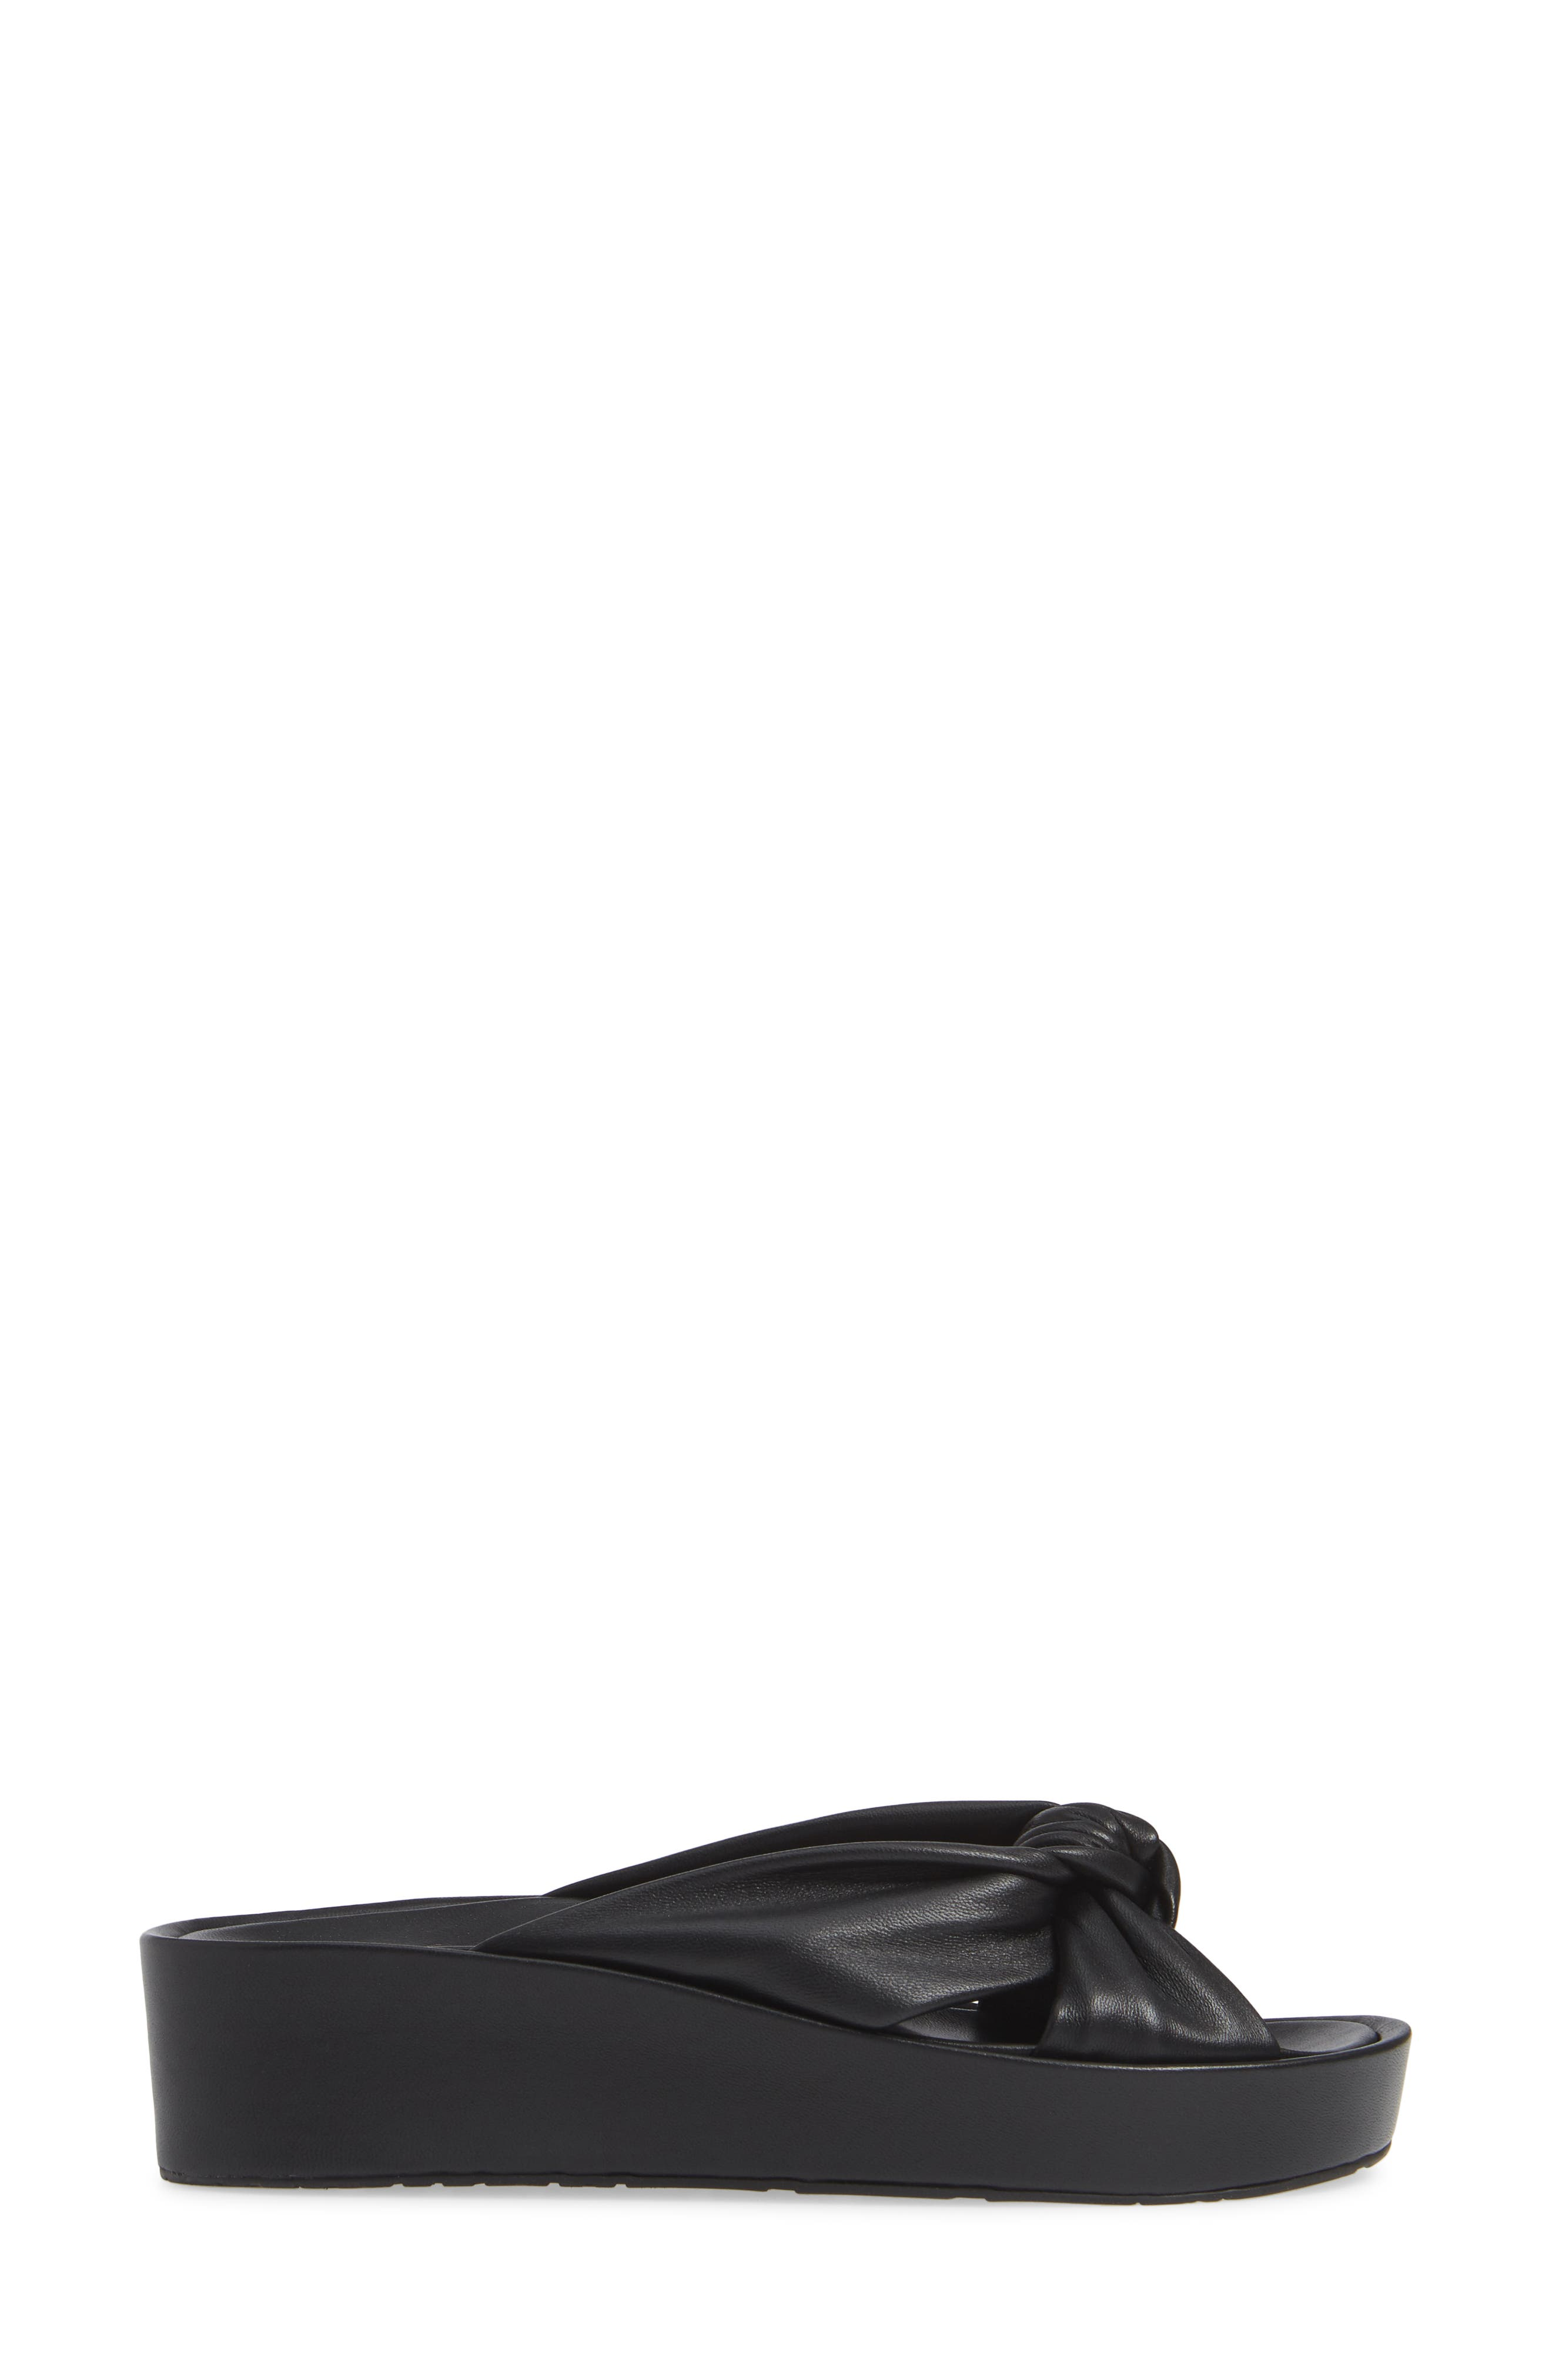 PEDRO GARCIA, Lany Platform Slide Sandal, Alternate thumbnail 3, color, BLACK LEATHER